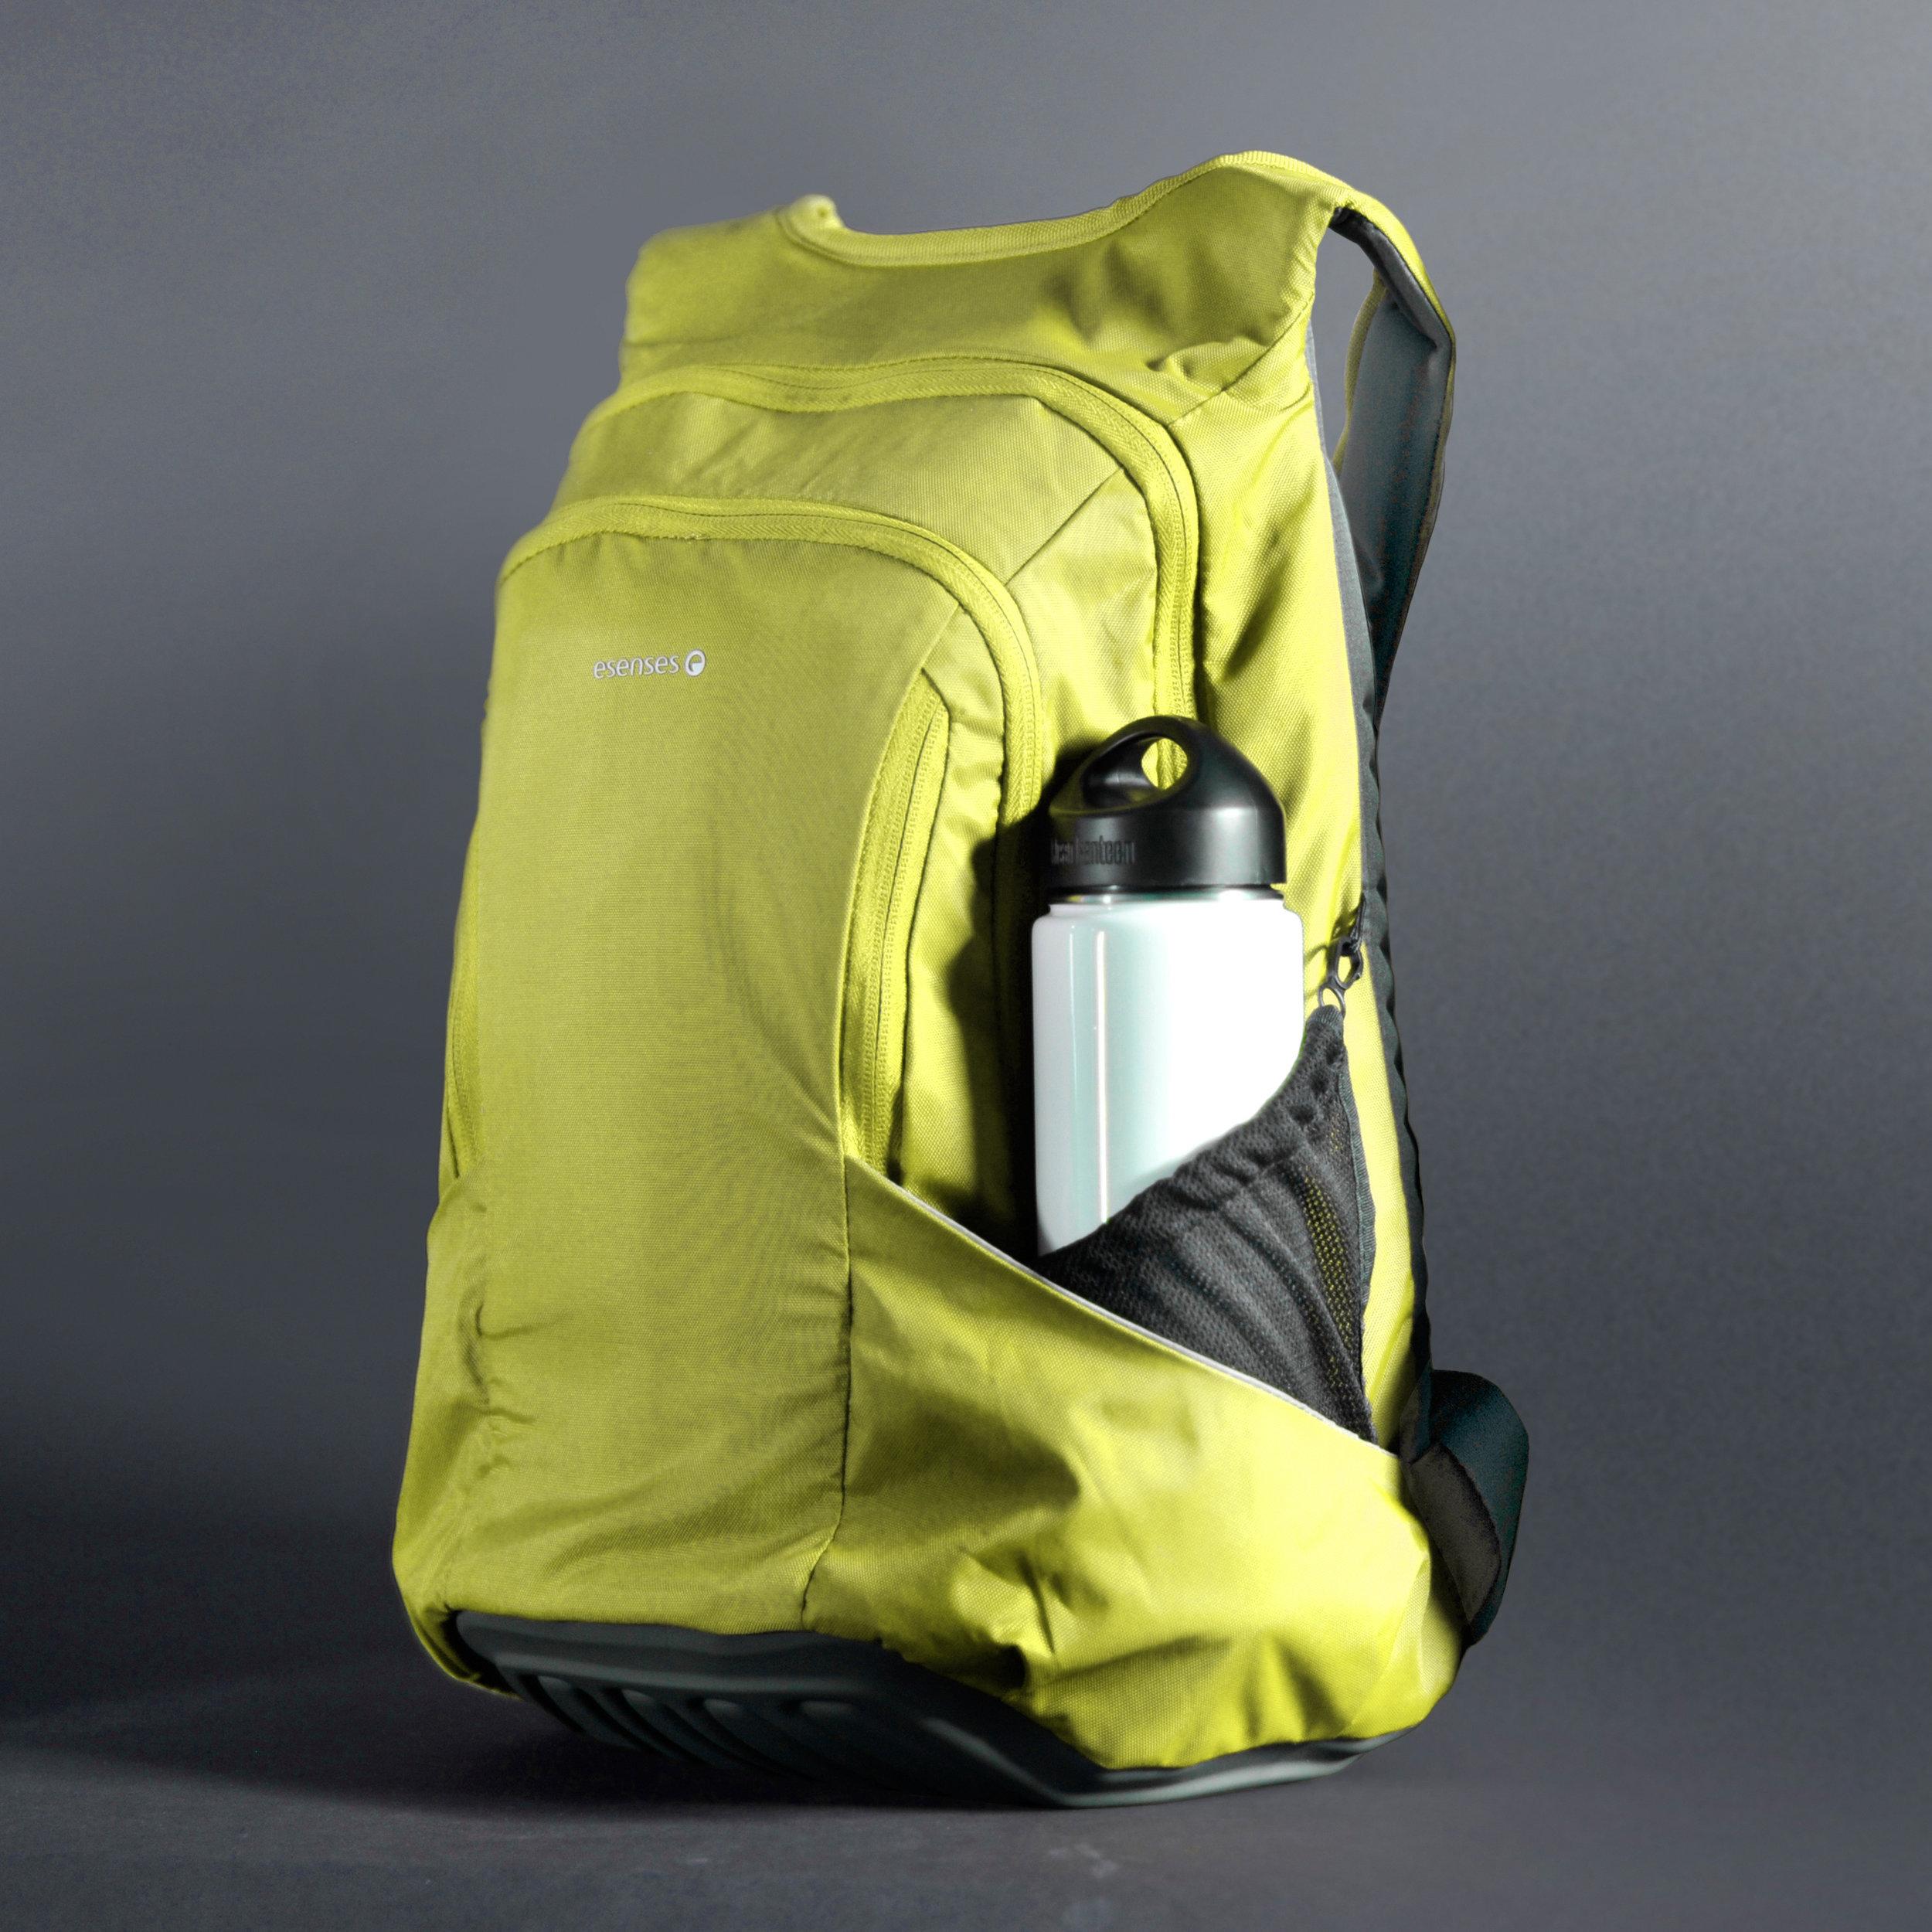 Esenses Bags